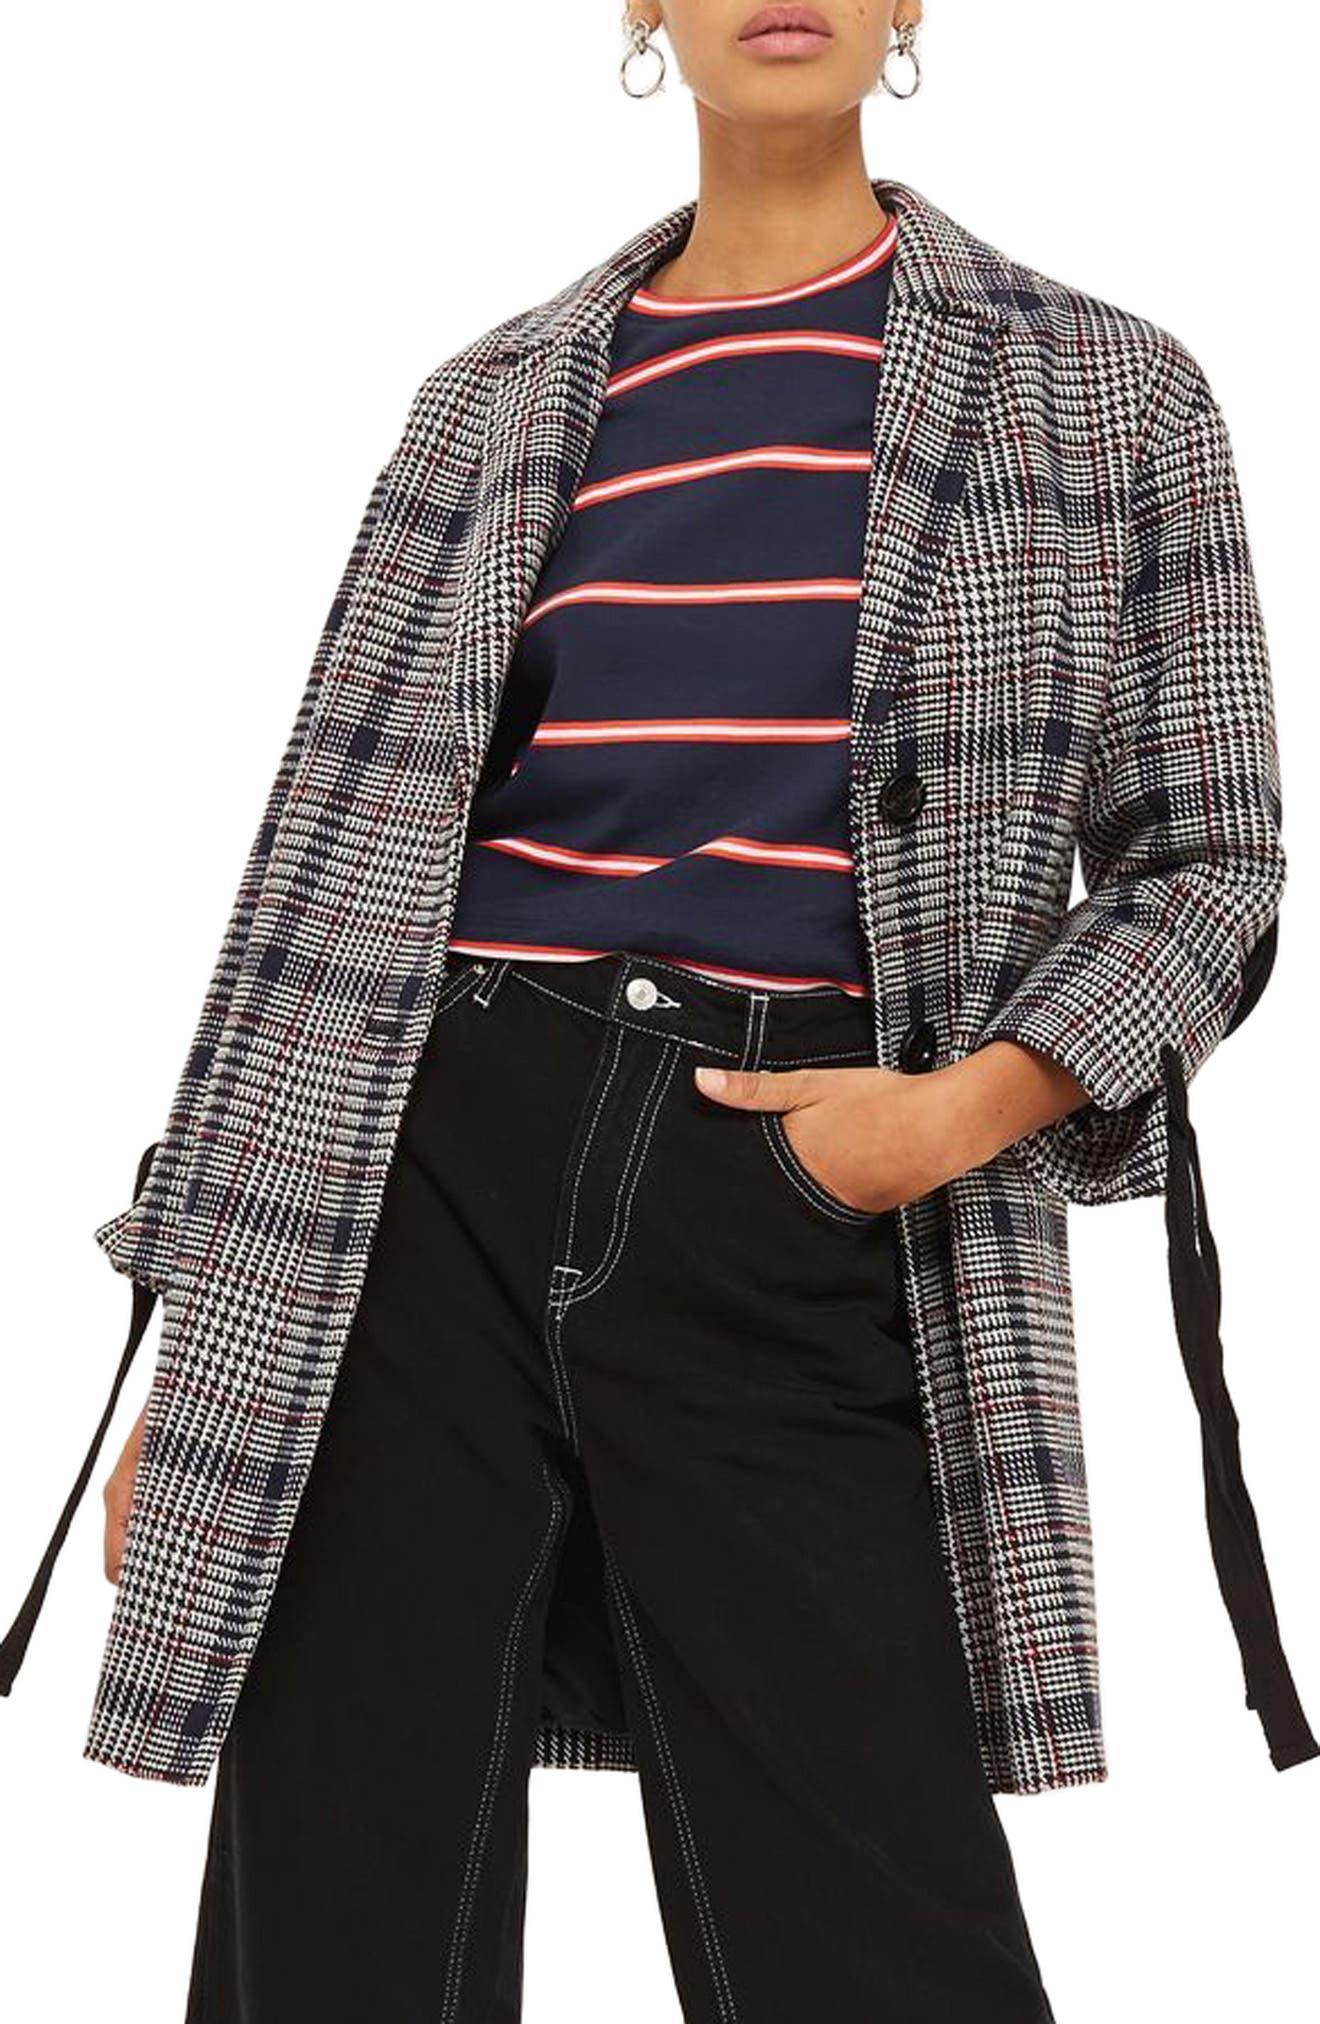 Lace-Up Sleeve Check Coat,                             Main thumbnail 1, color,                             Navy Blue Multi